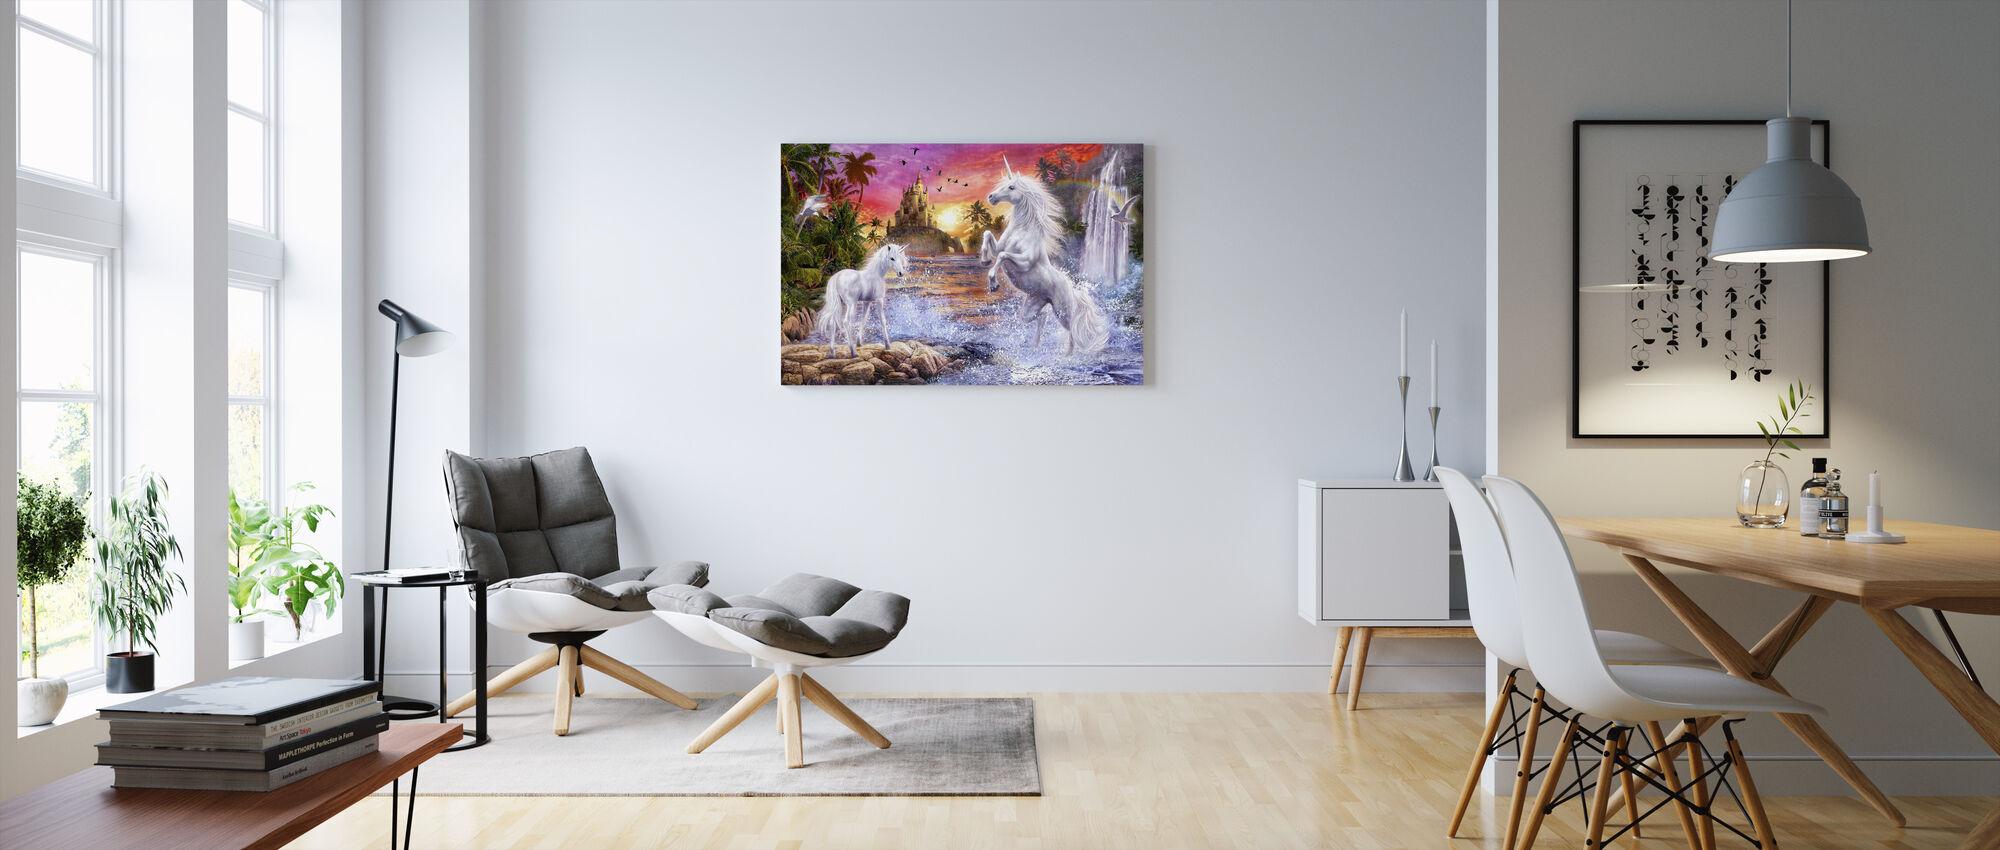 Unicorn Waterfall Sunset - Canvas print - Living Room